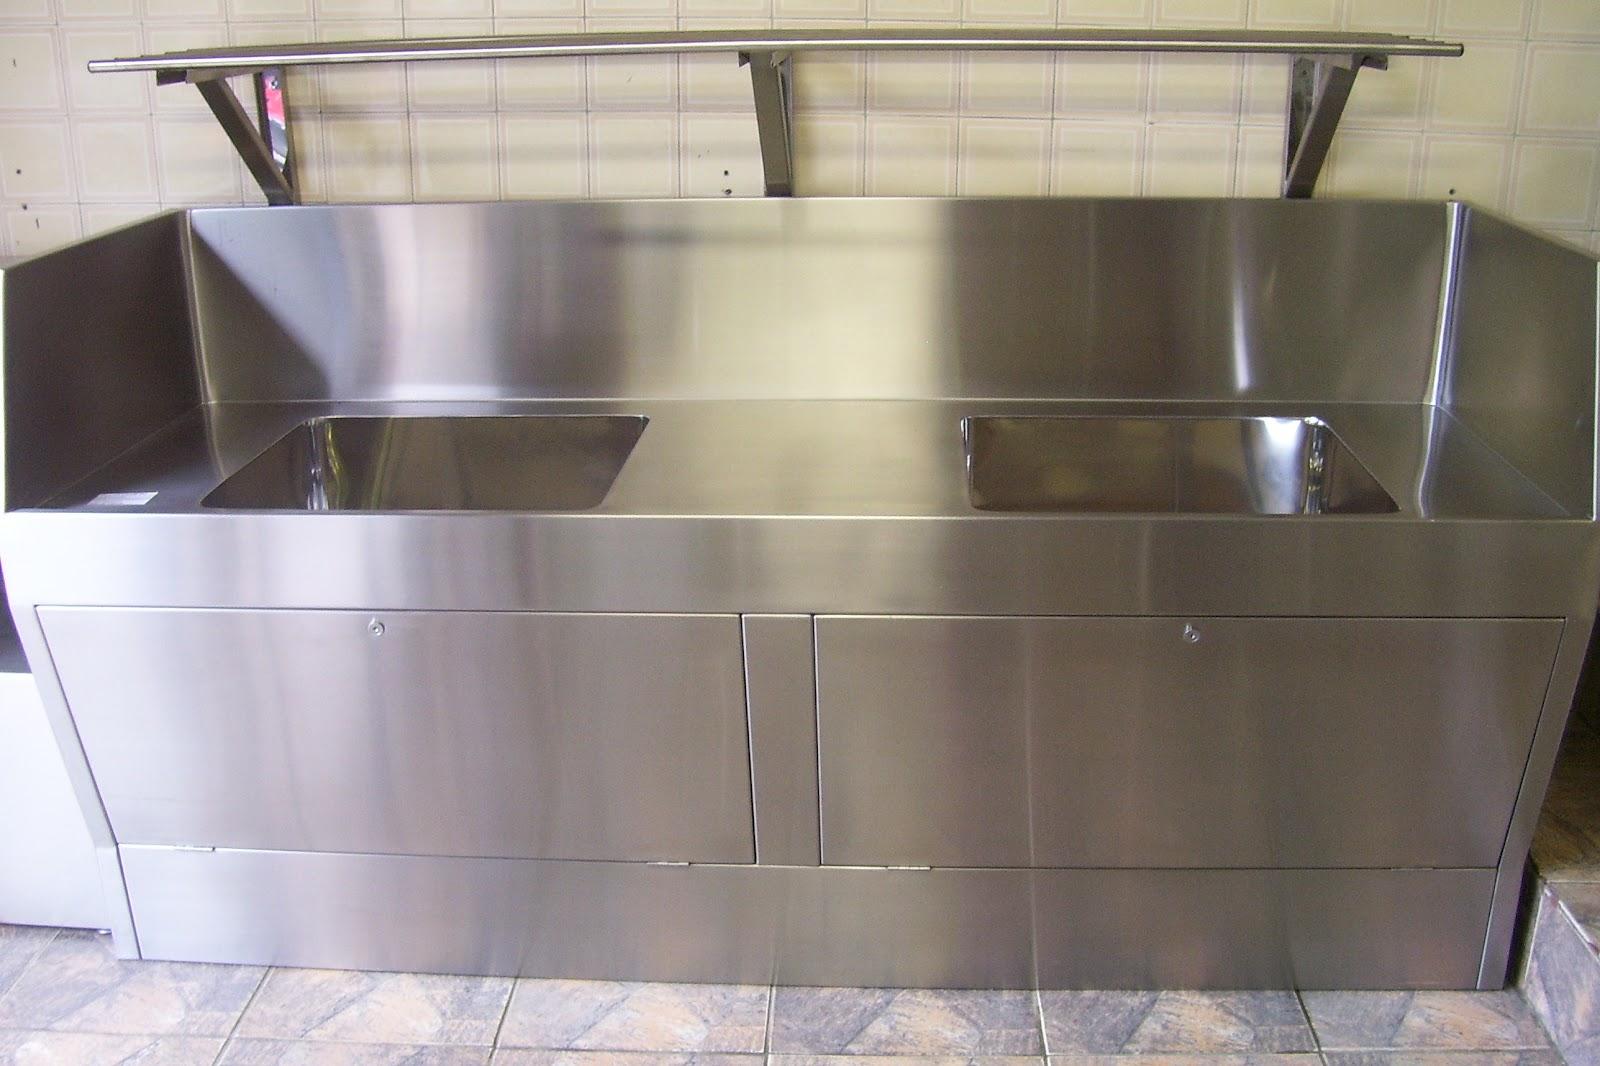 #7C704F 1600 x 1066 · 214 kB · jpeg equipamentos para cozinhas industriais  1600x1066 px Projetos Cozinhas Industriais #73 imagens